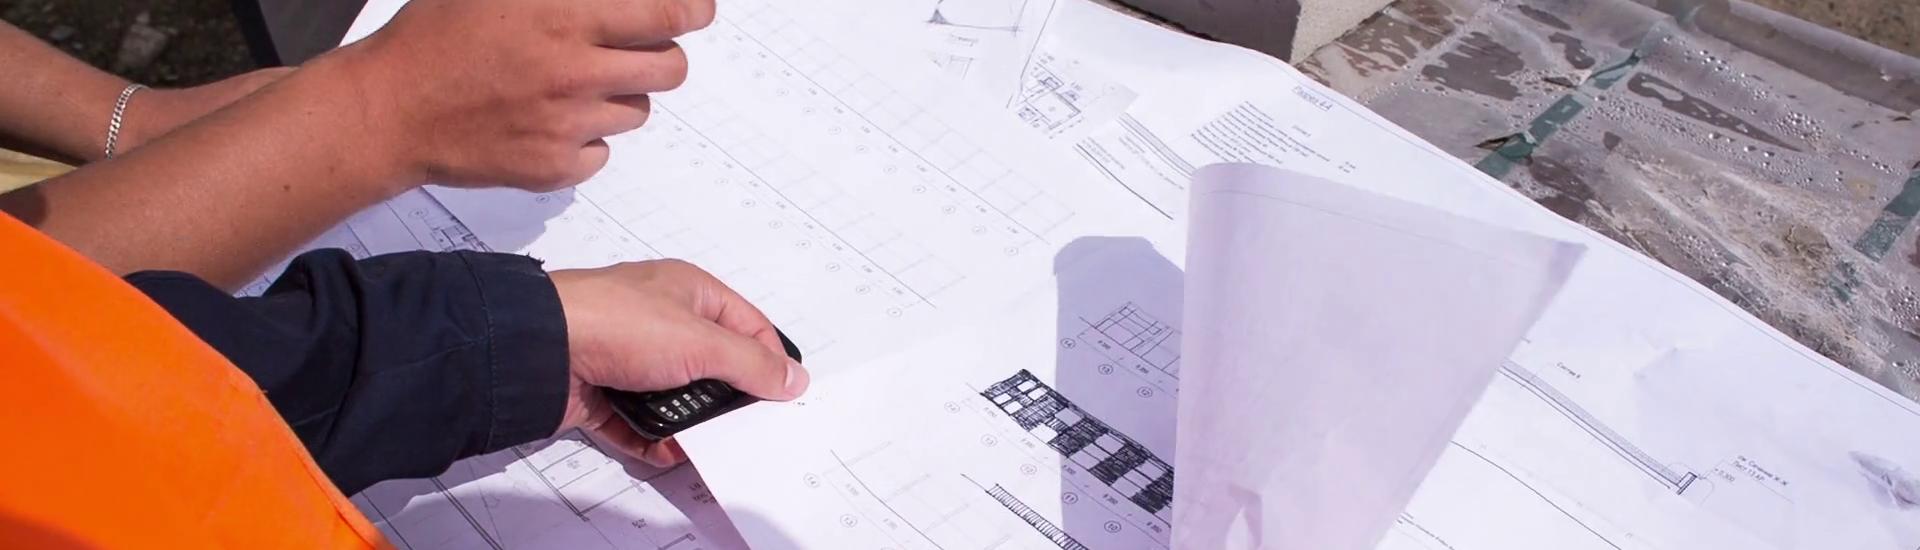 CONSTRUCTION DOCUMENTS -